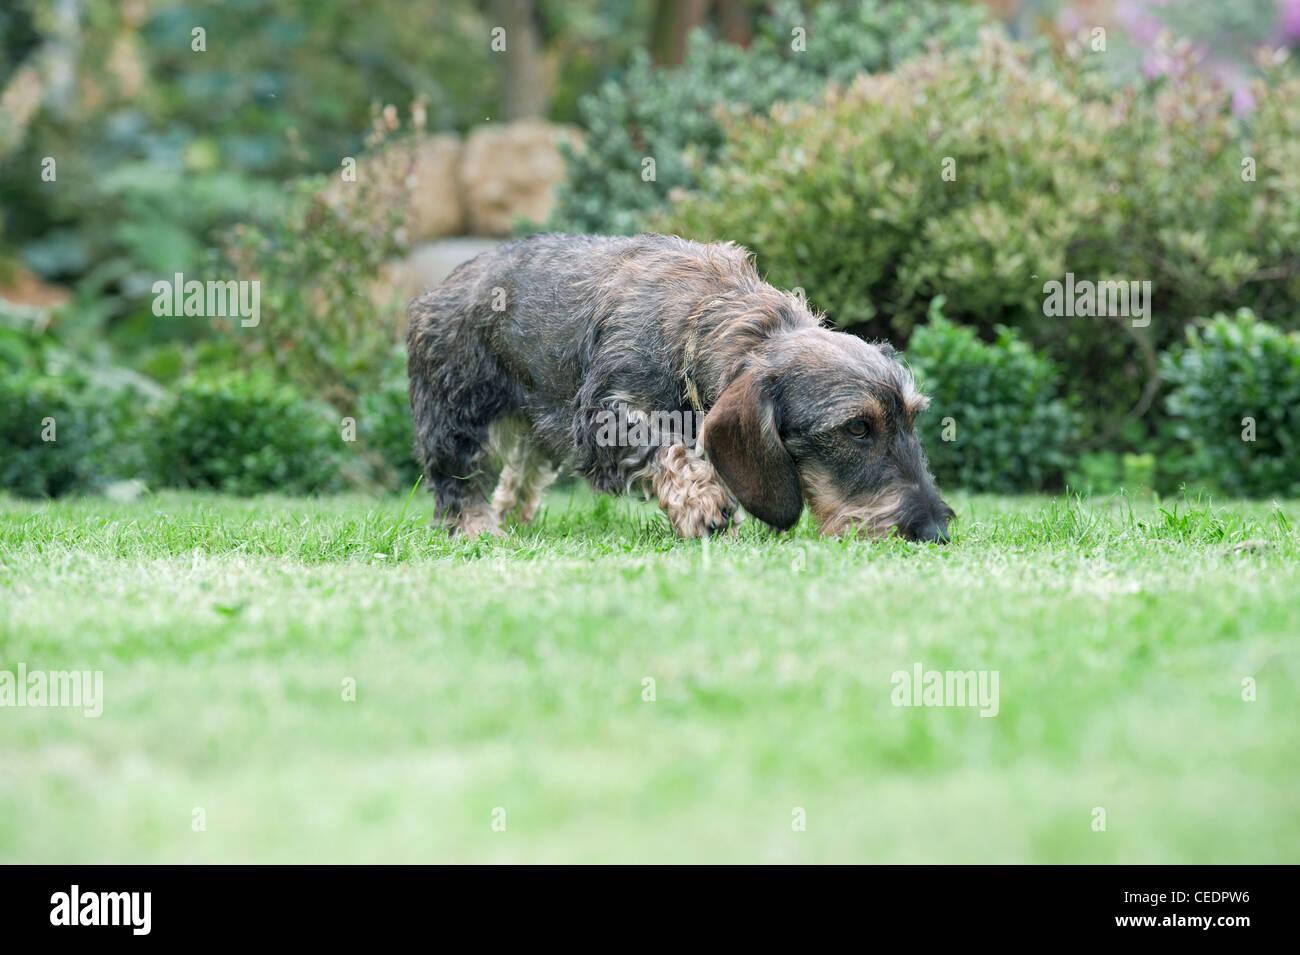 A small dog in a garden - Stock Image